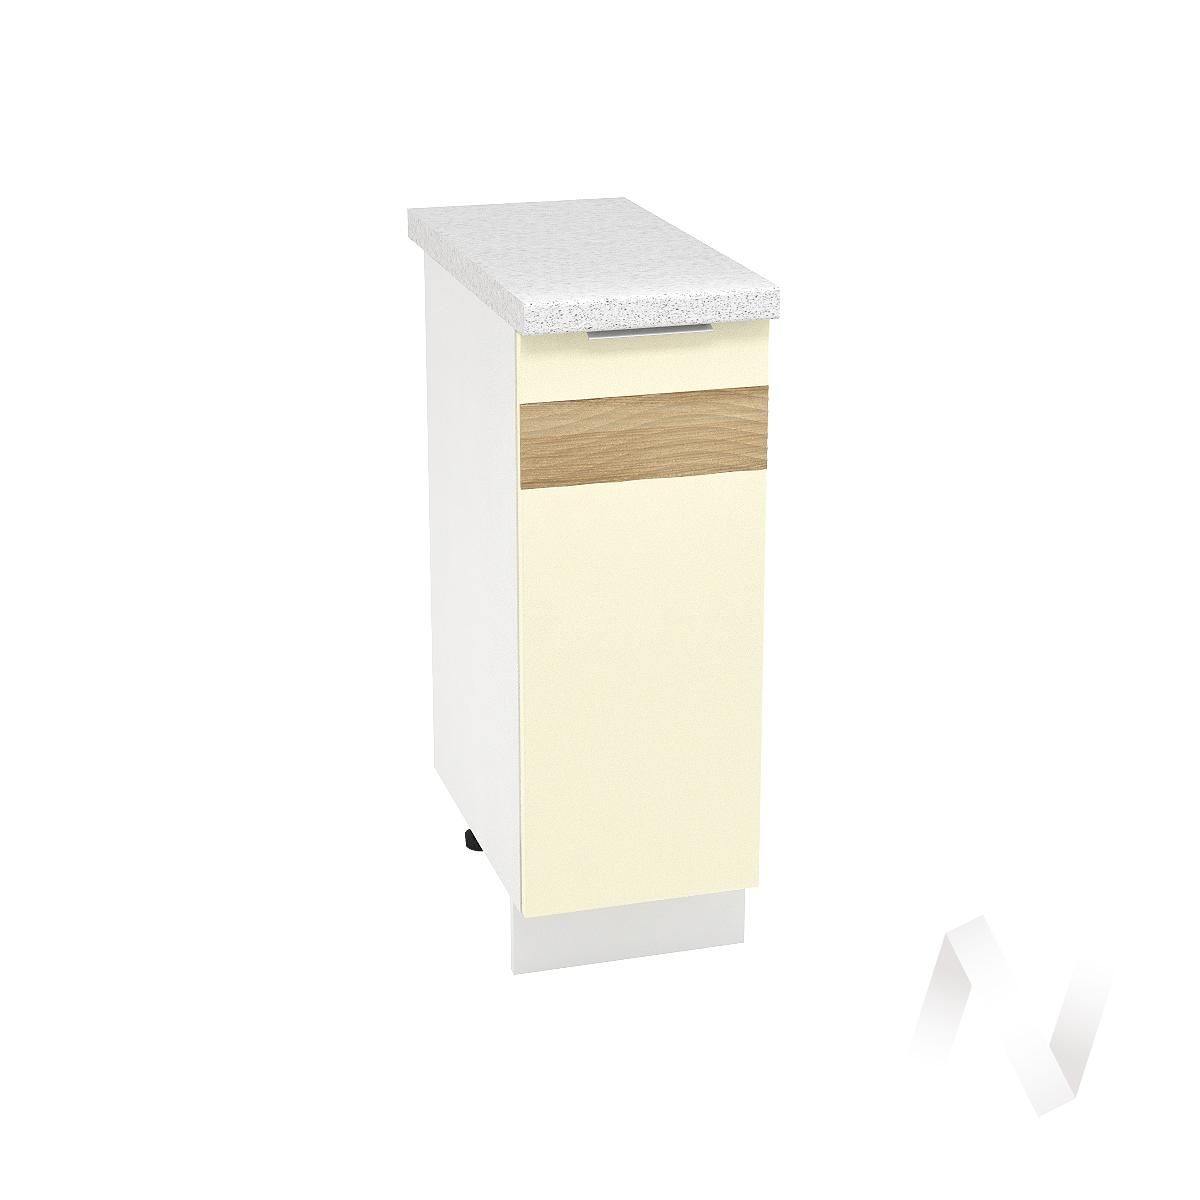 "Кухня ""Терра"": Шкаф нижний левый 300, ШН 300 (ваниль софт/корпус белый)"